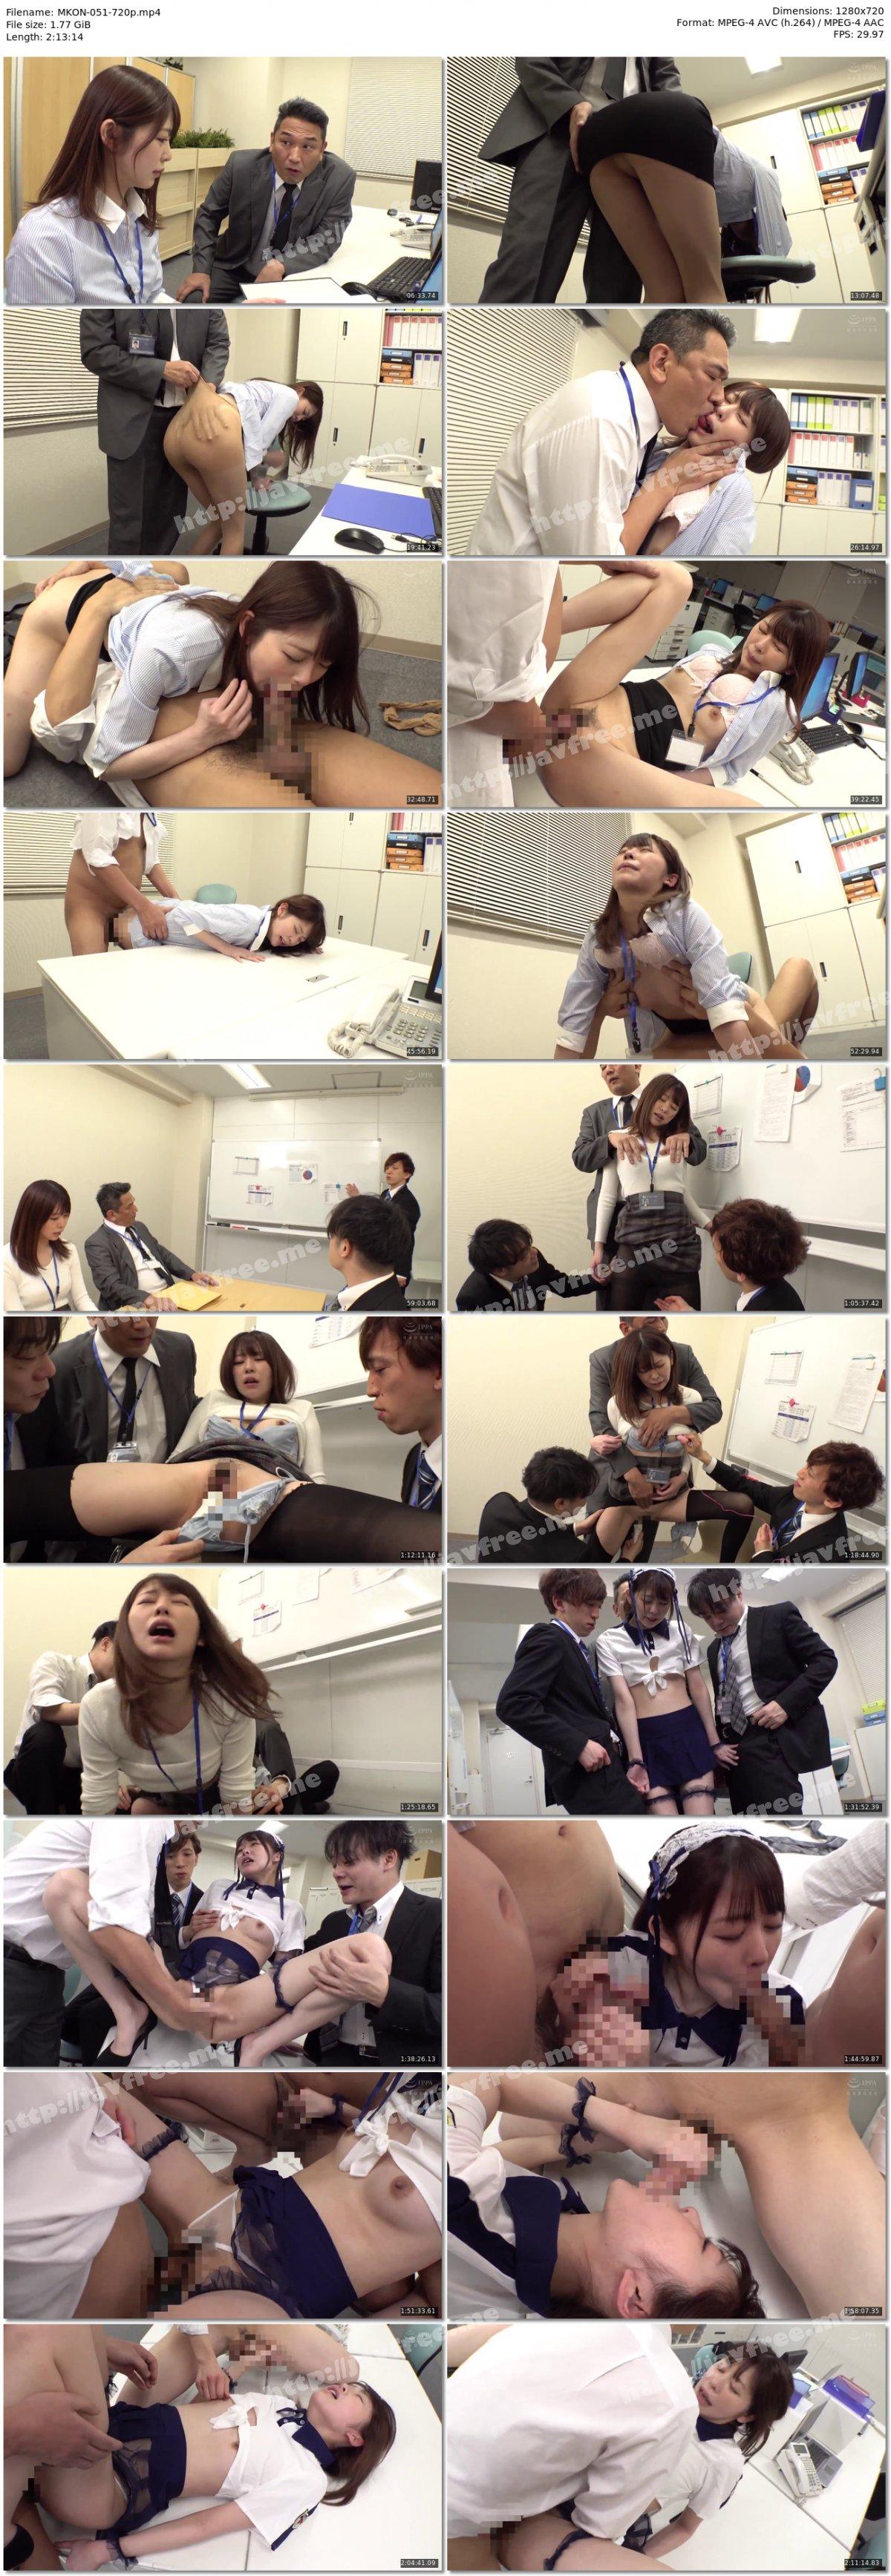 [HD][MKON-051] 愛する彼女がゴリゴリ体育会系のパワハラ上司に寝取られた話 森日向子 - image MKON-051-720p on https://javfree.me